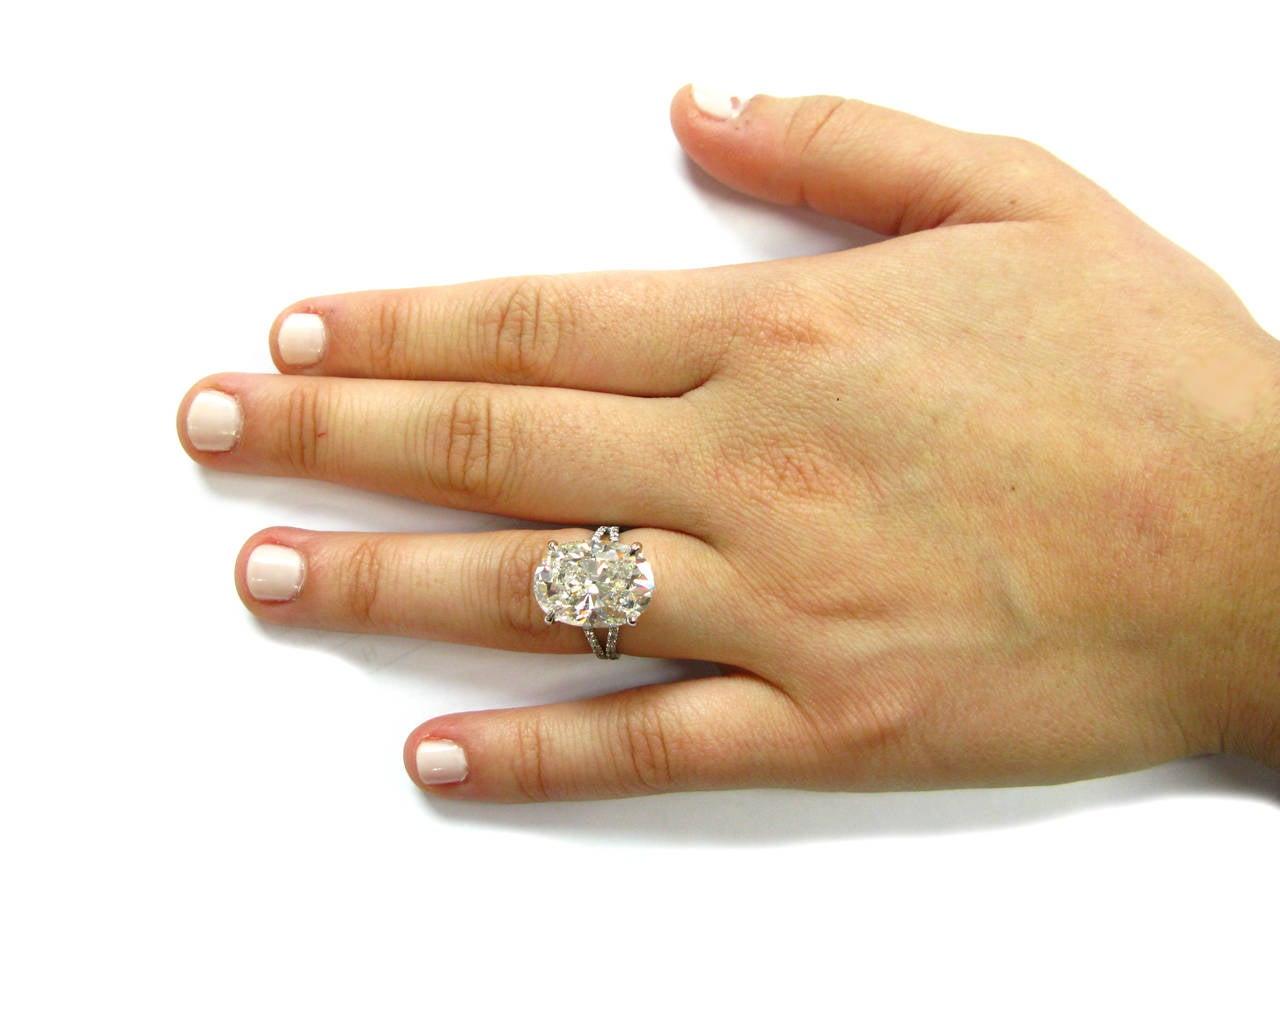 10 10 Carat Gia Cert Oval Diamond Platinum Ring For Sale